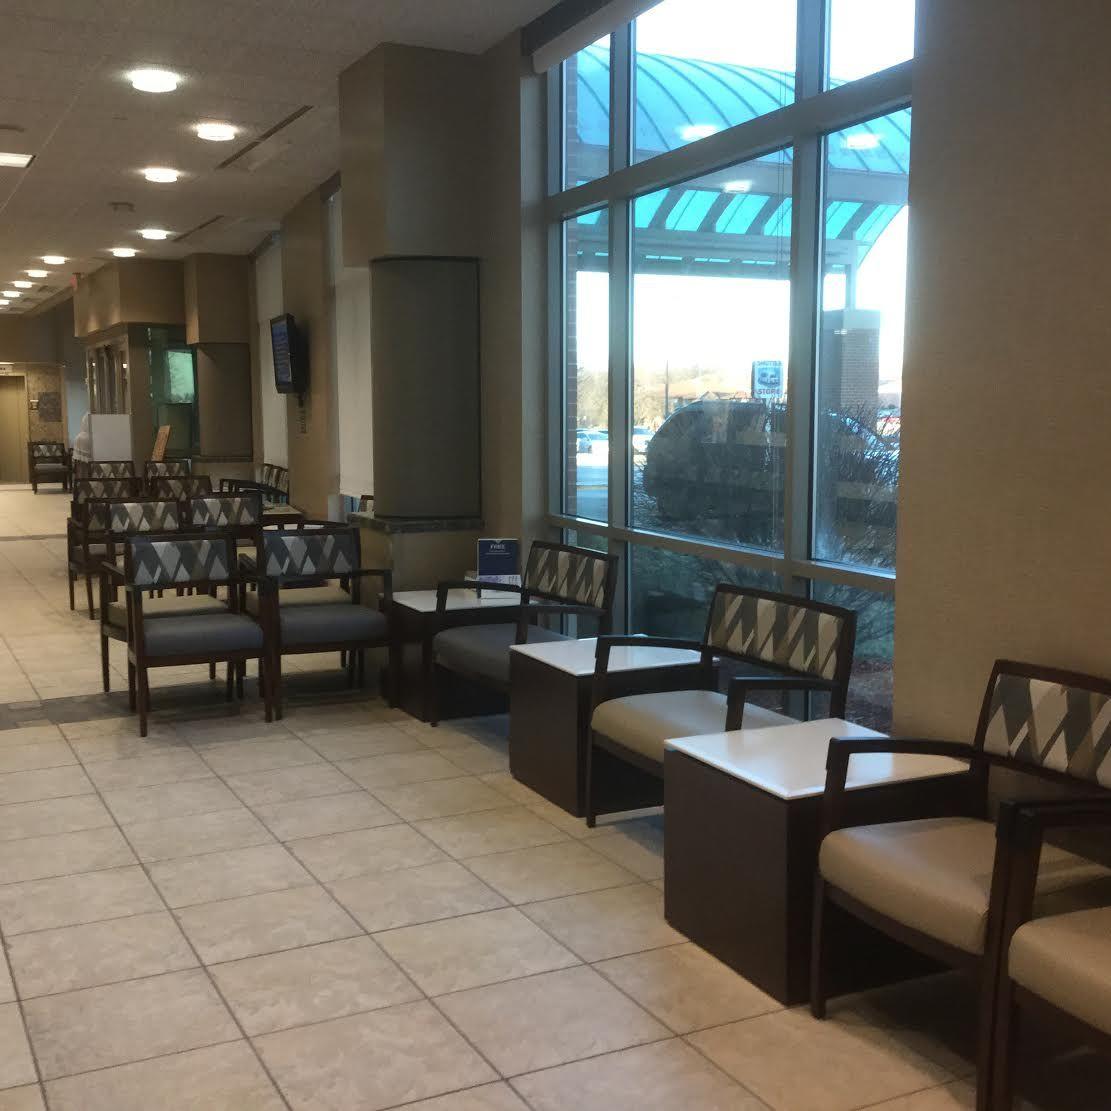 Coxhealth springfield mo acquaint seating and myriad